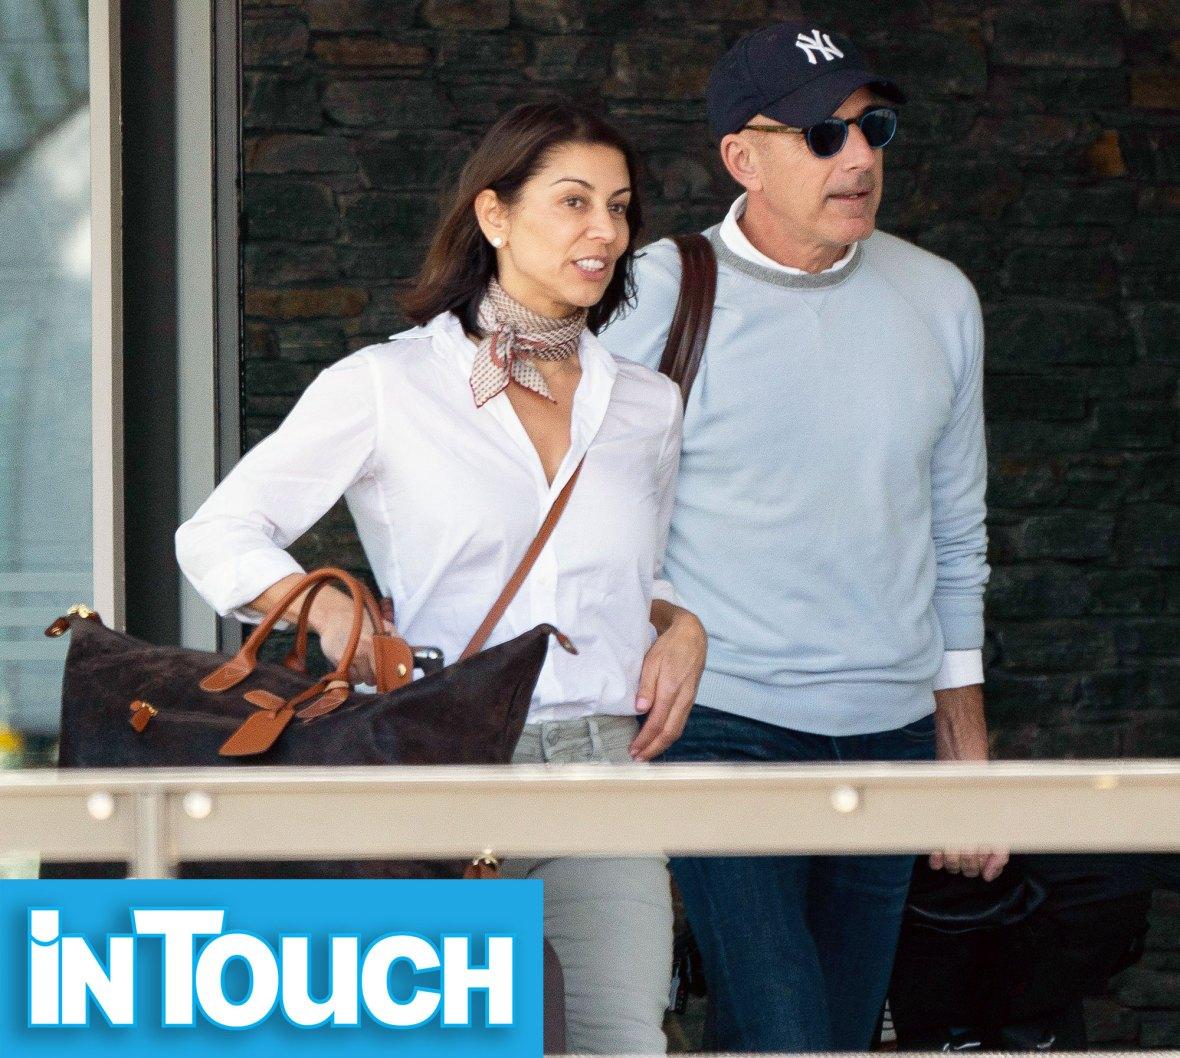 Who Is Shamin Abas Matt Lauer's New Girlfriend 1